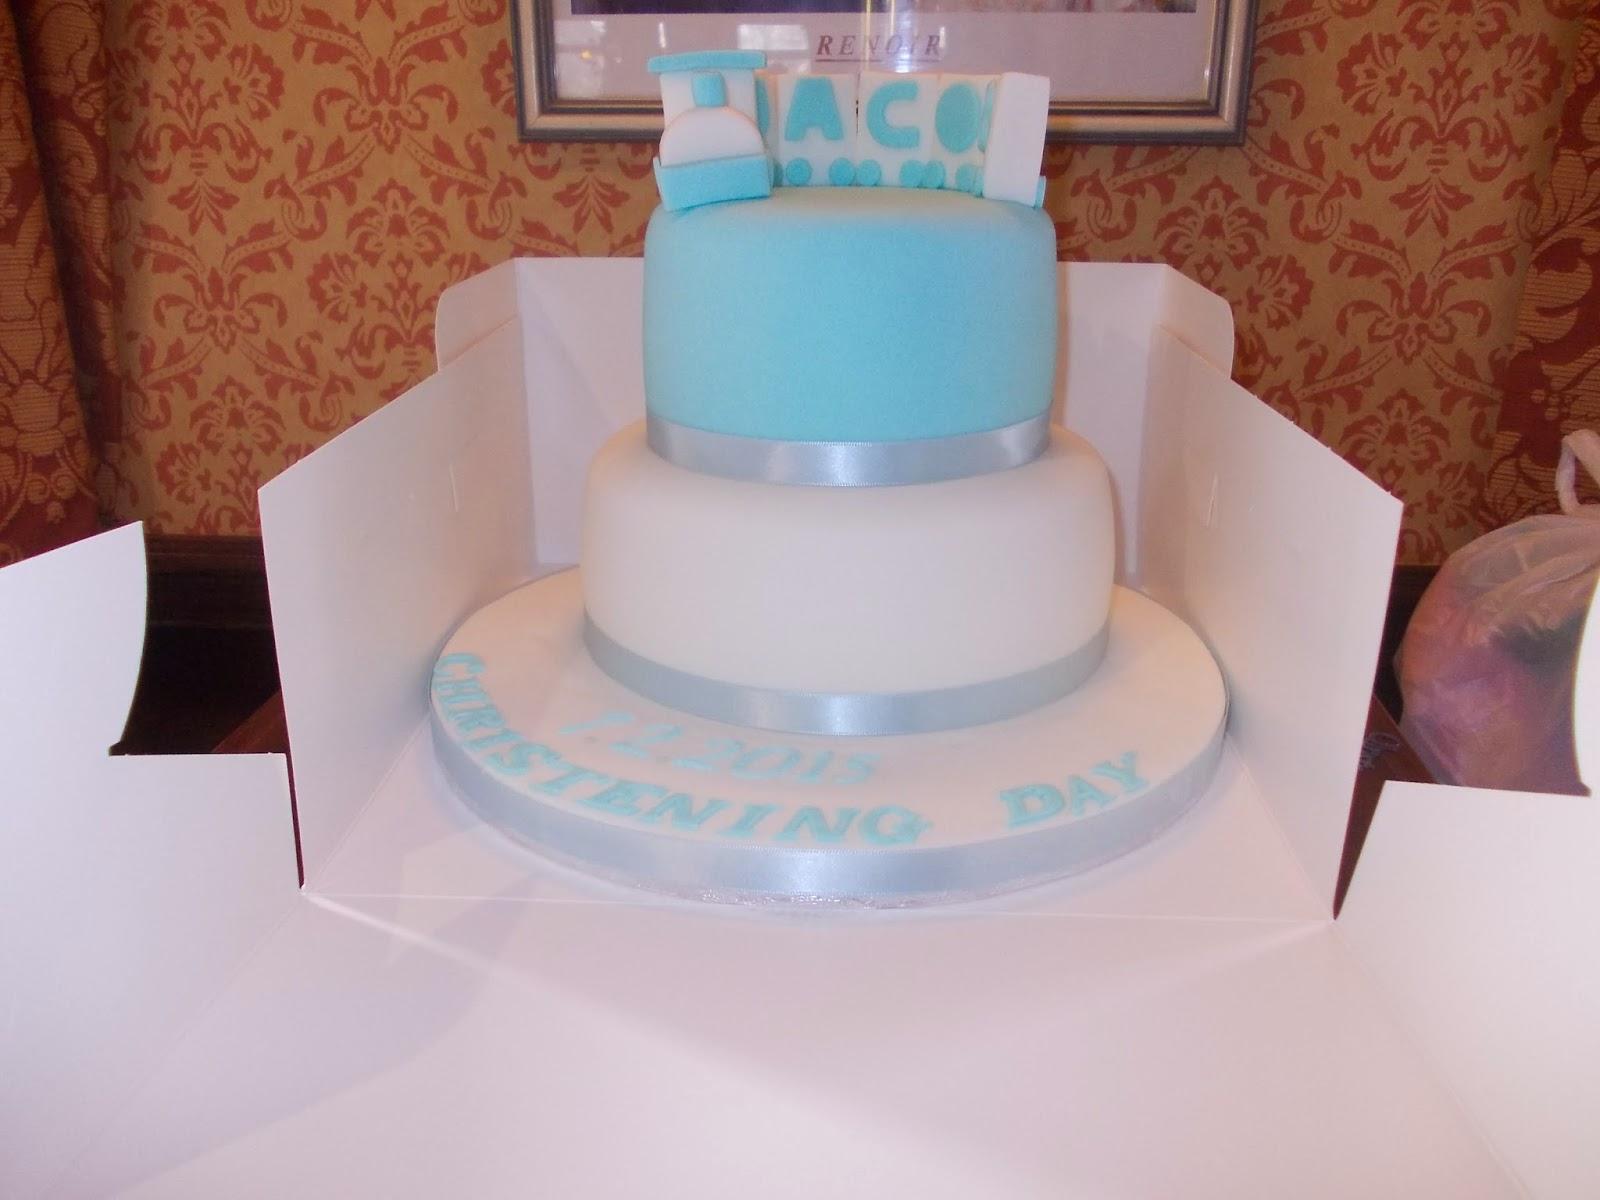 Jacobs christening cake